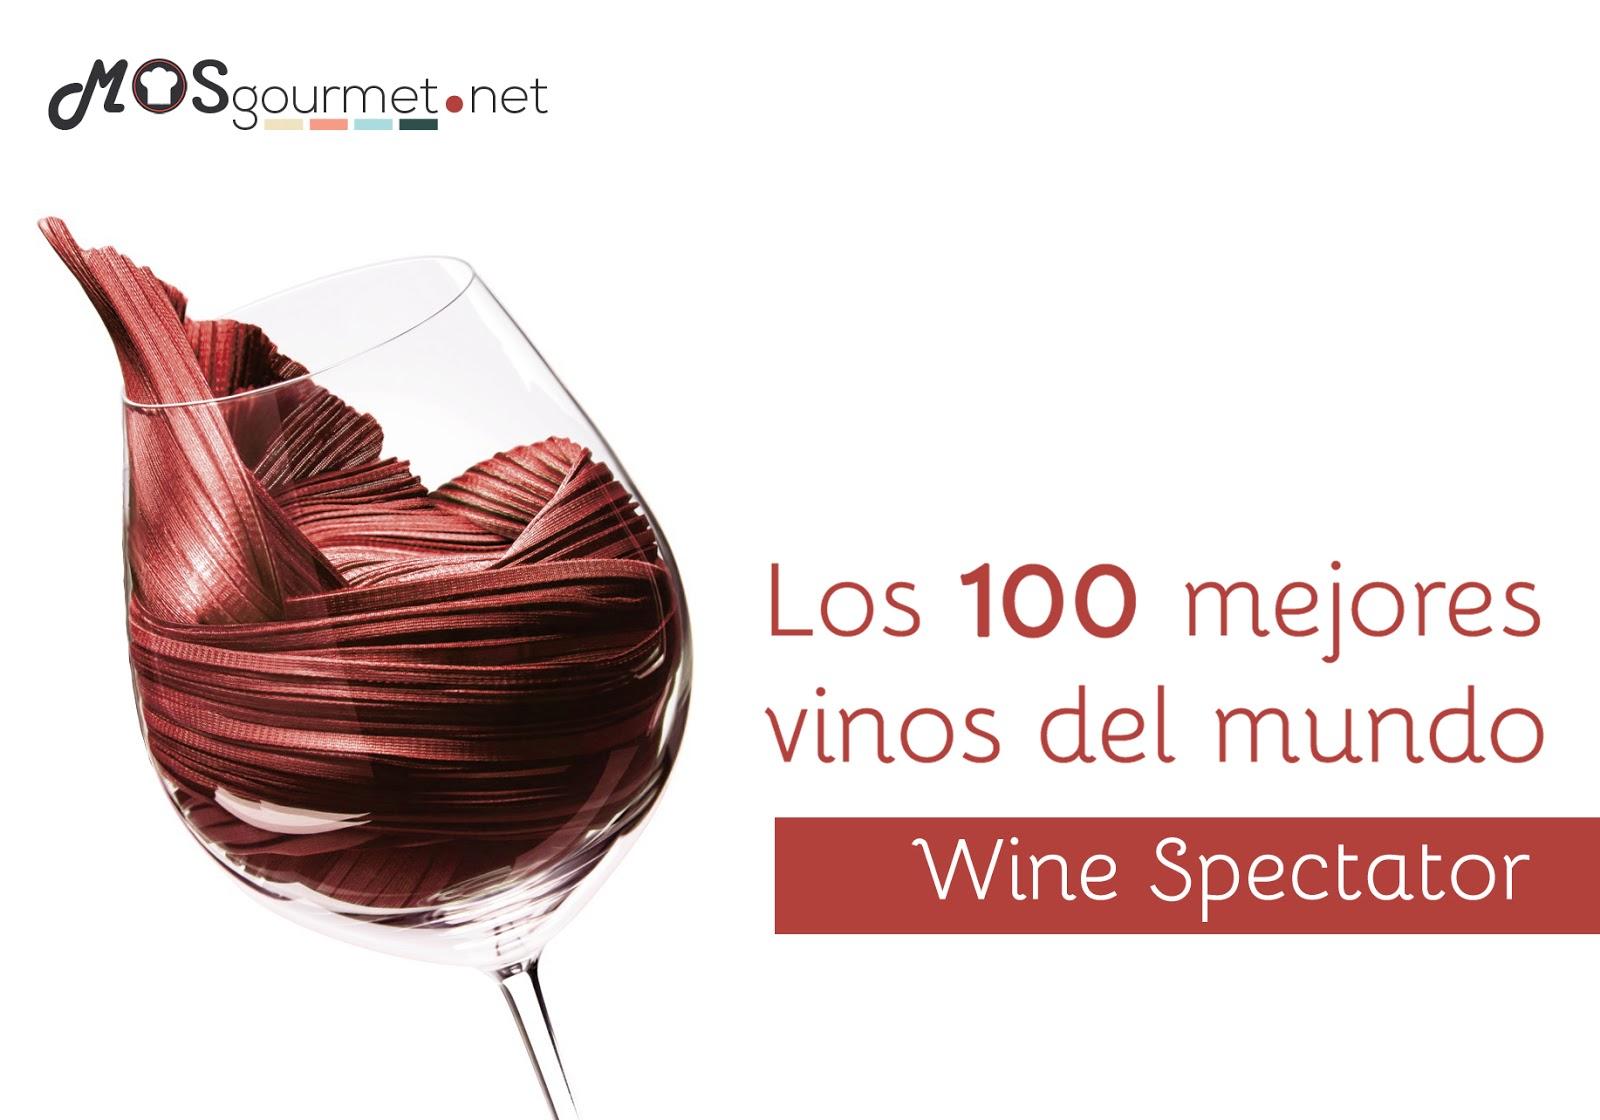 100 mejores vinos: